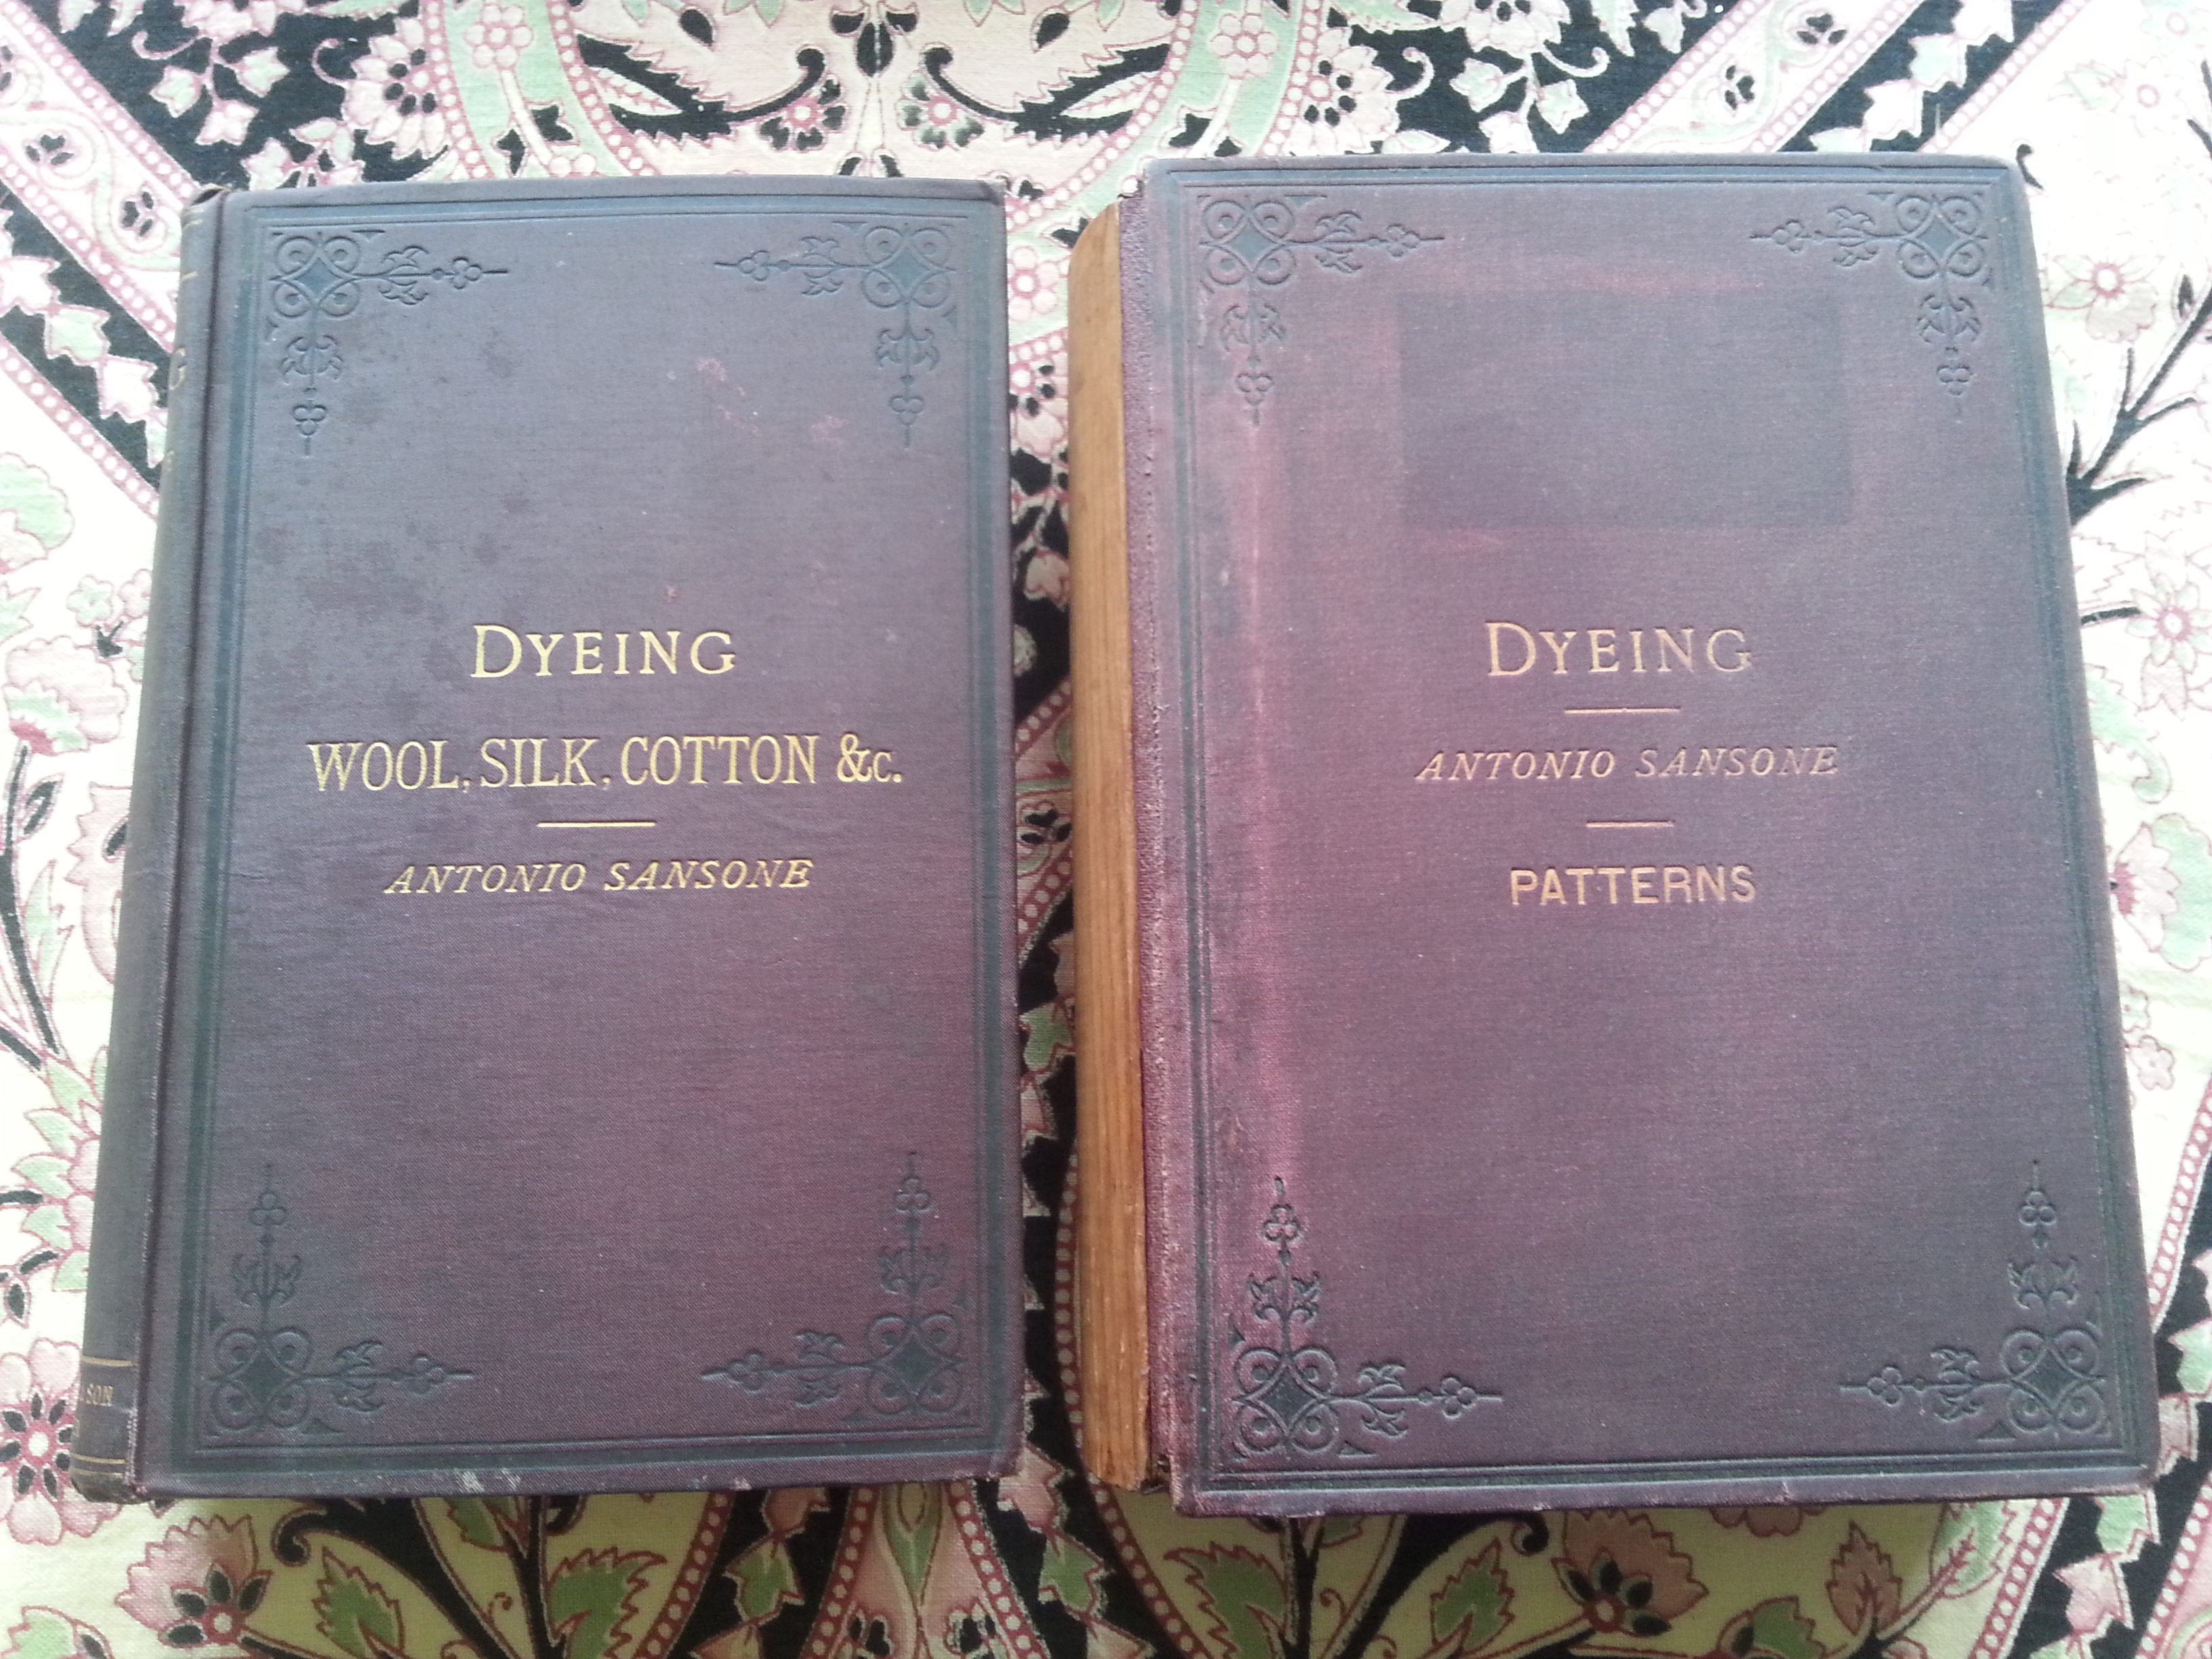 Dye history books - Image of volumes 1 and 2 Antonio Sansonne Dyeing 1888